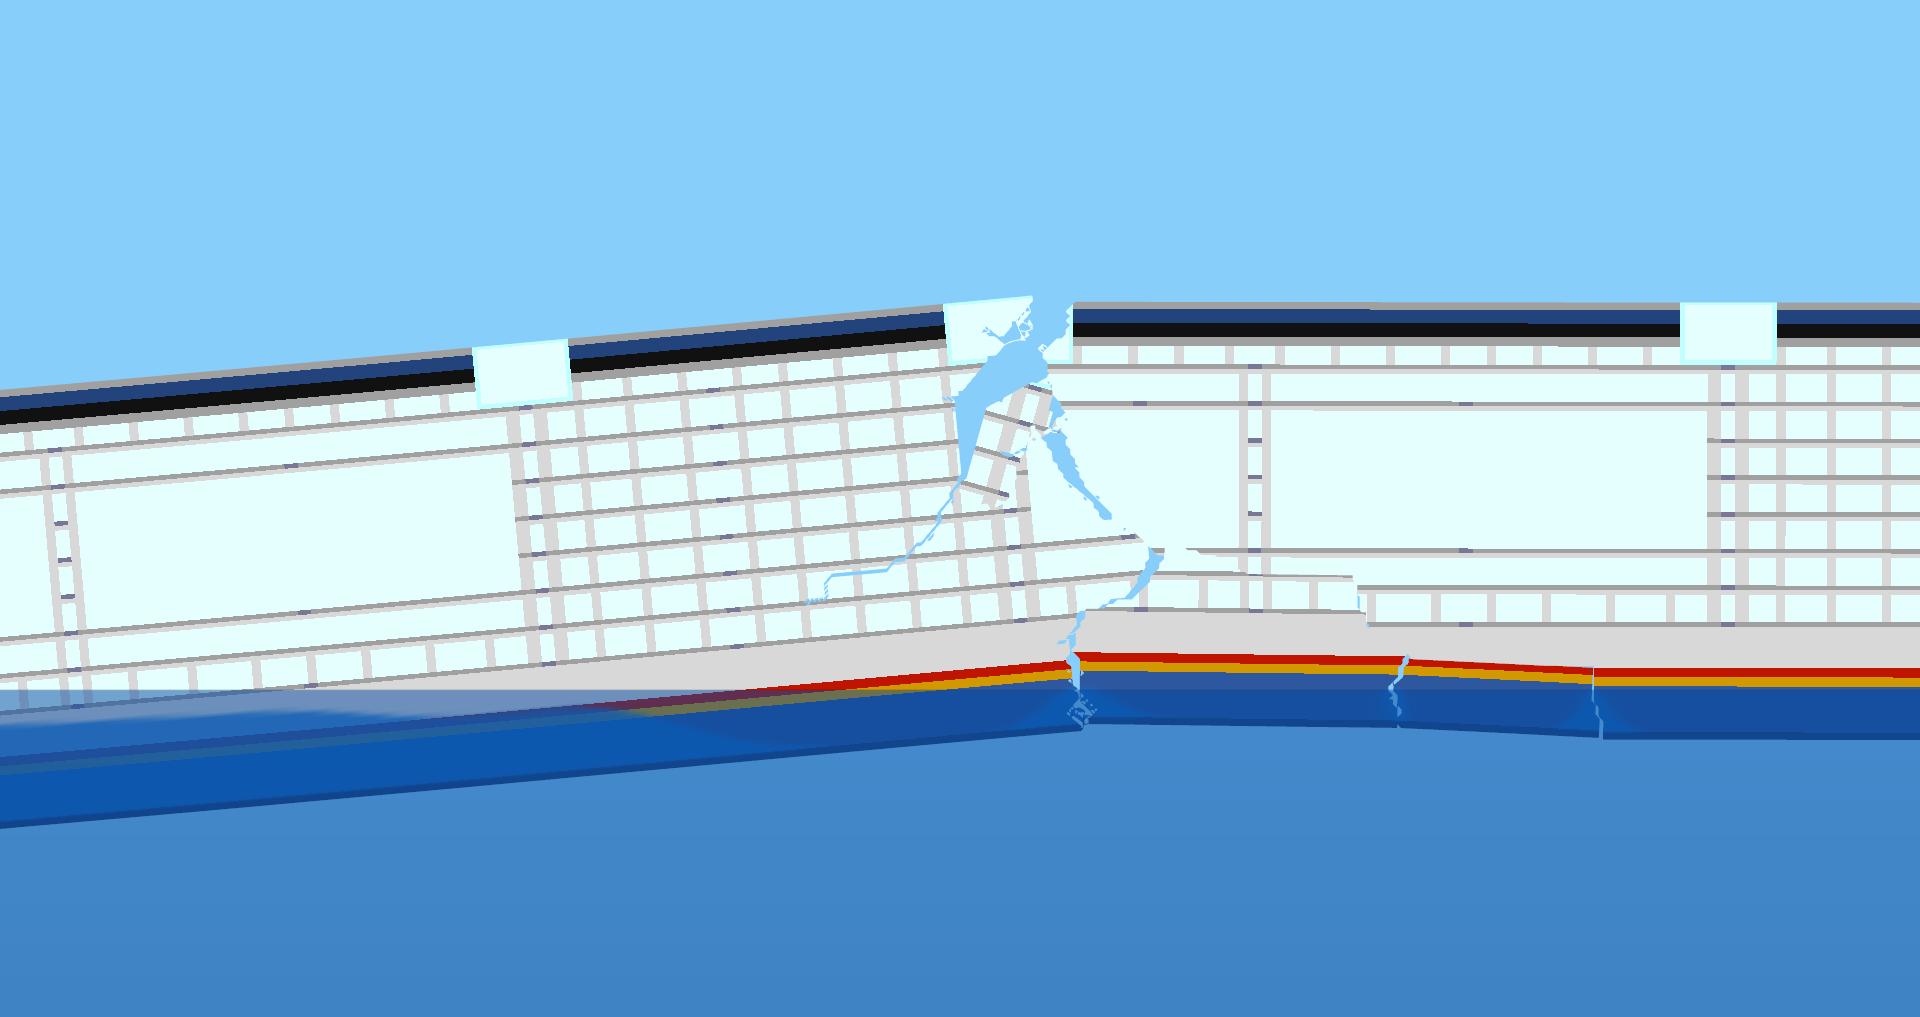 Sinking Simulator 2 Windows Mac Linux Game Indie Db